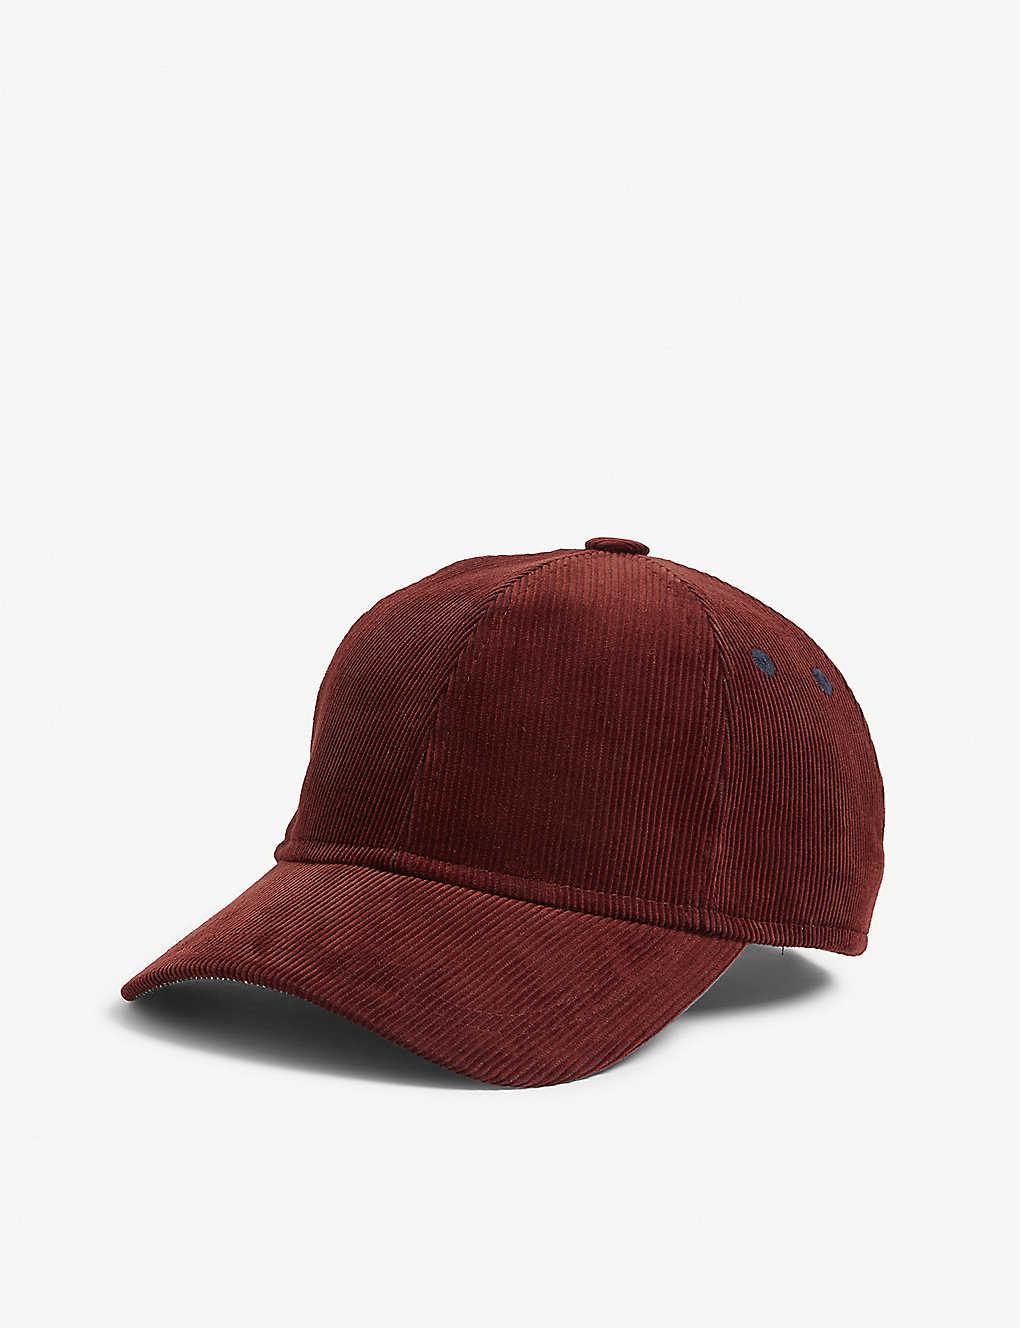 0992fd9b52d39e TED BAKER - Corduroy baseball cap | Selfridges.com